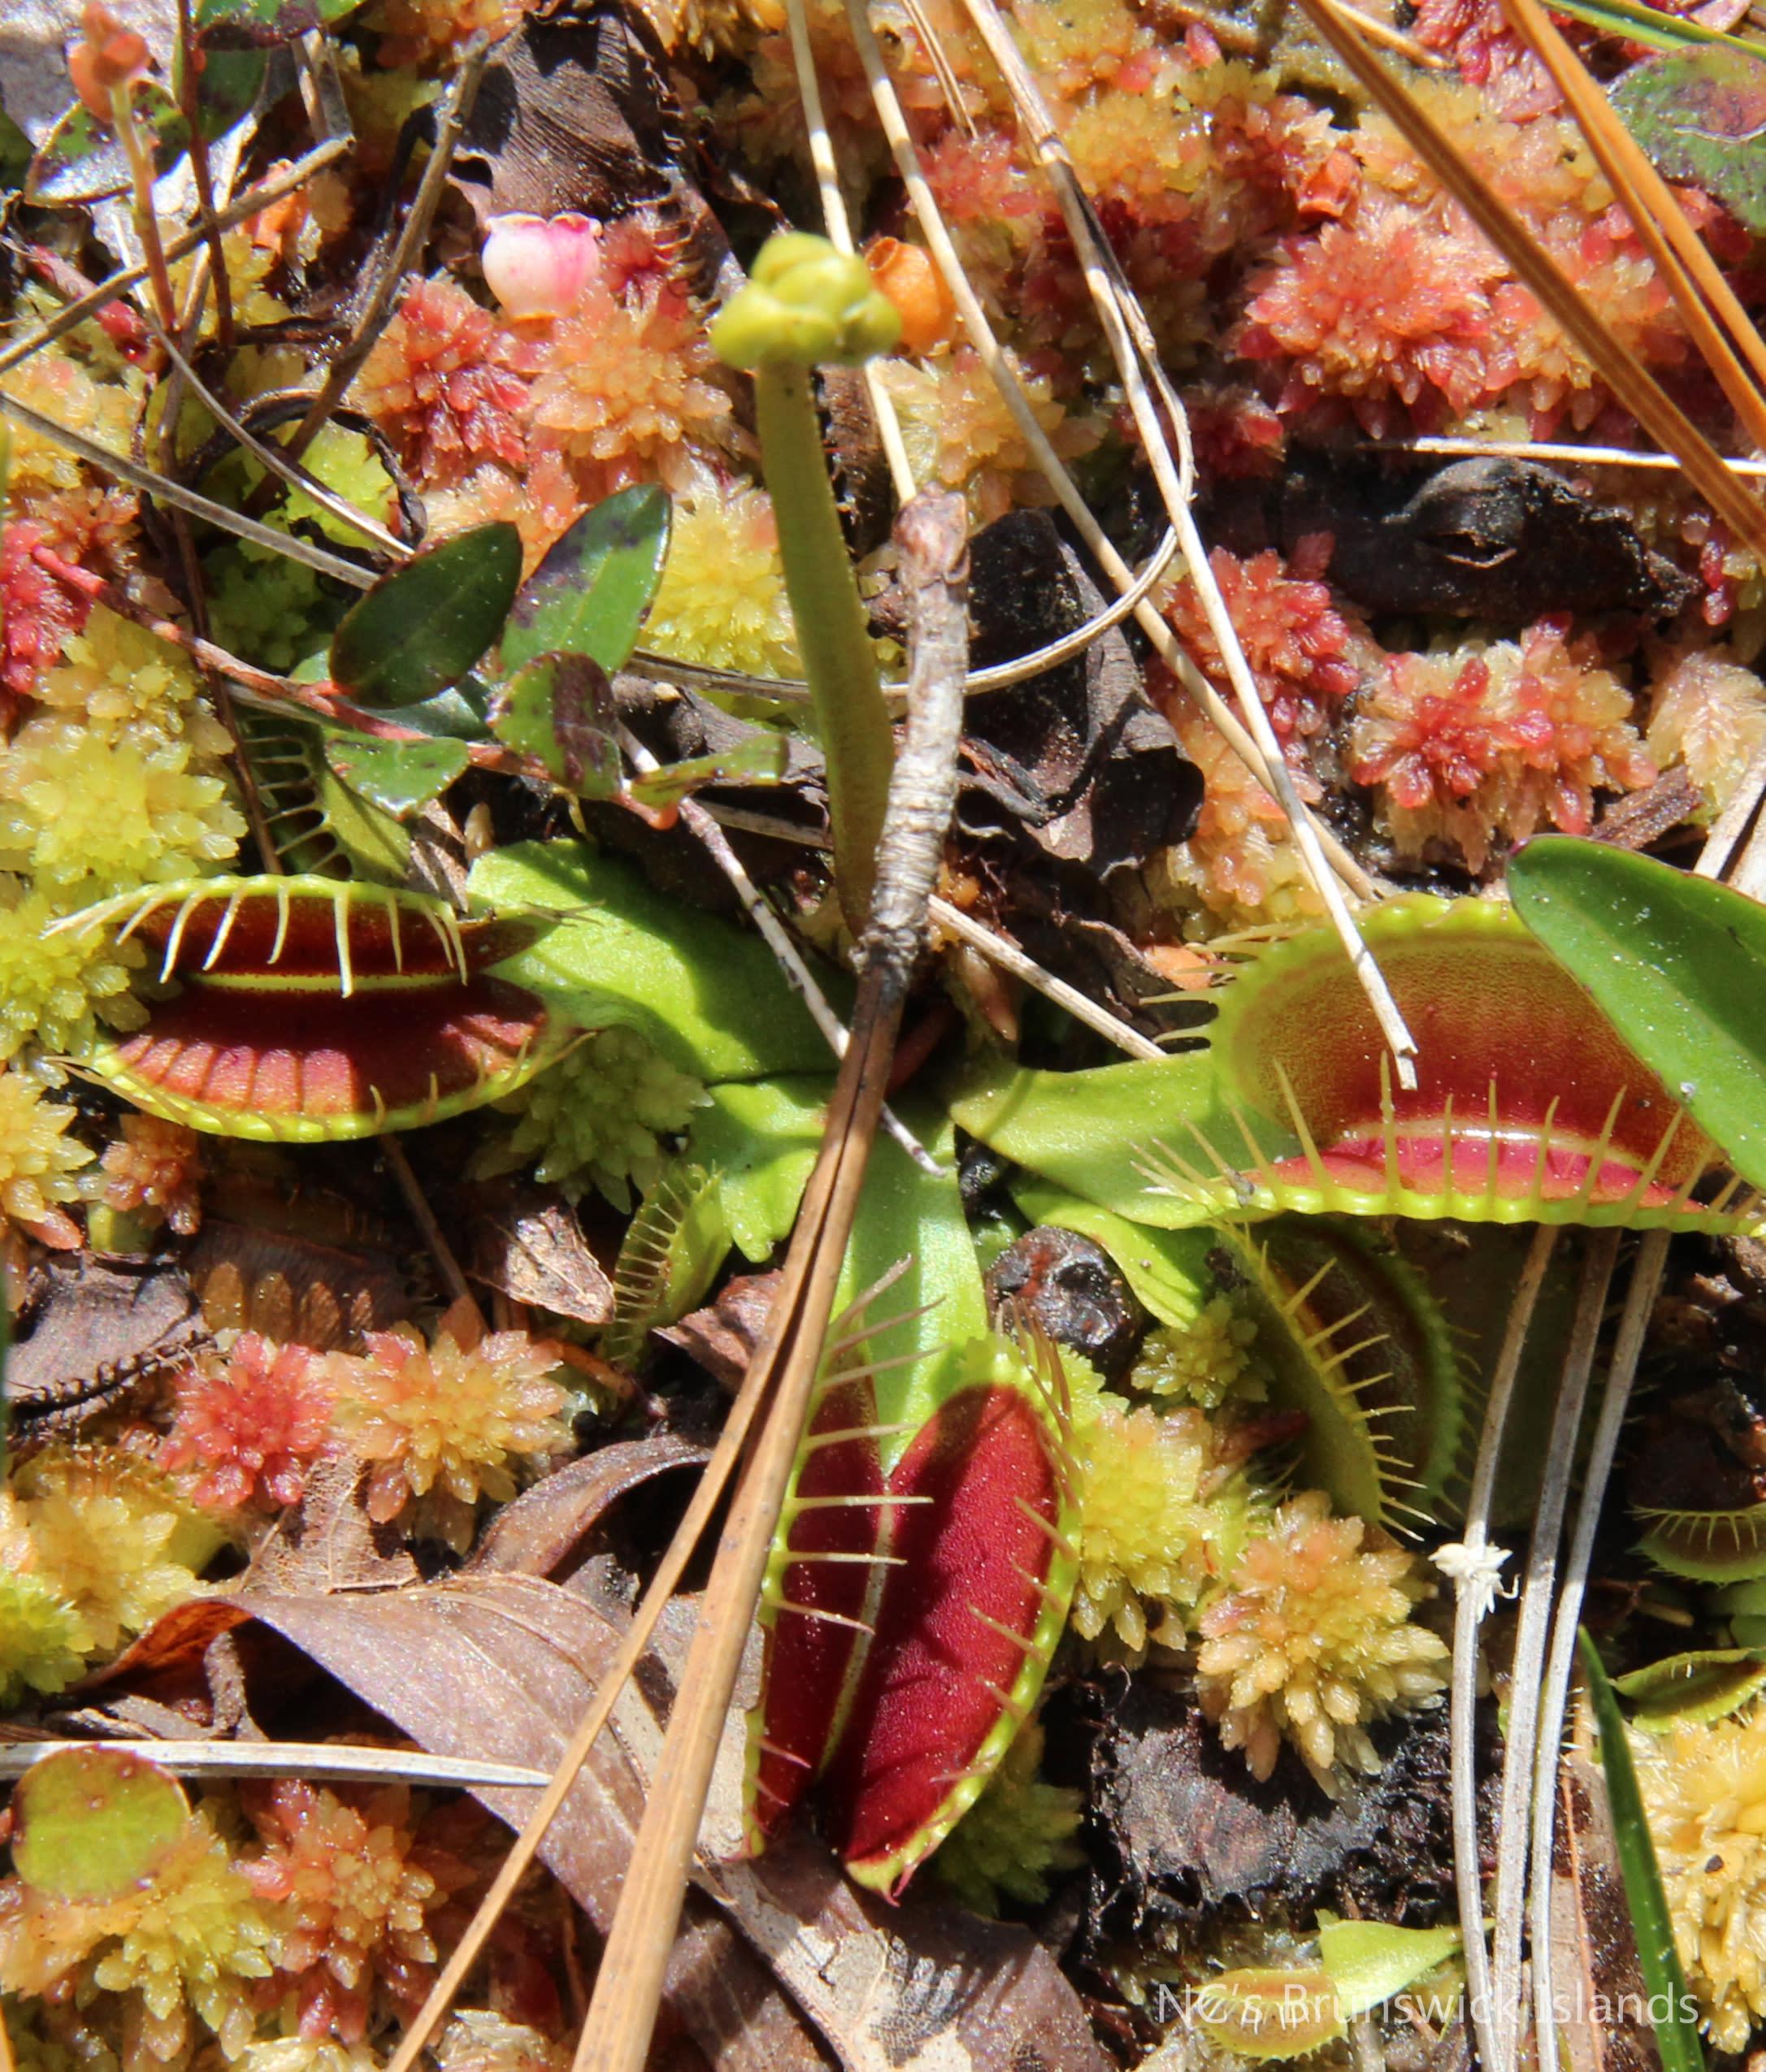 Venus Flytrap Green Swamp Nature Preserve